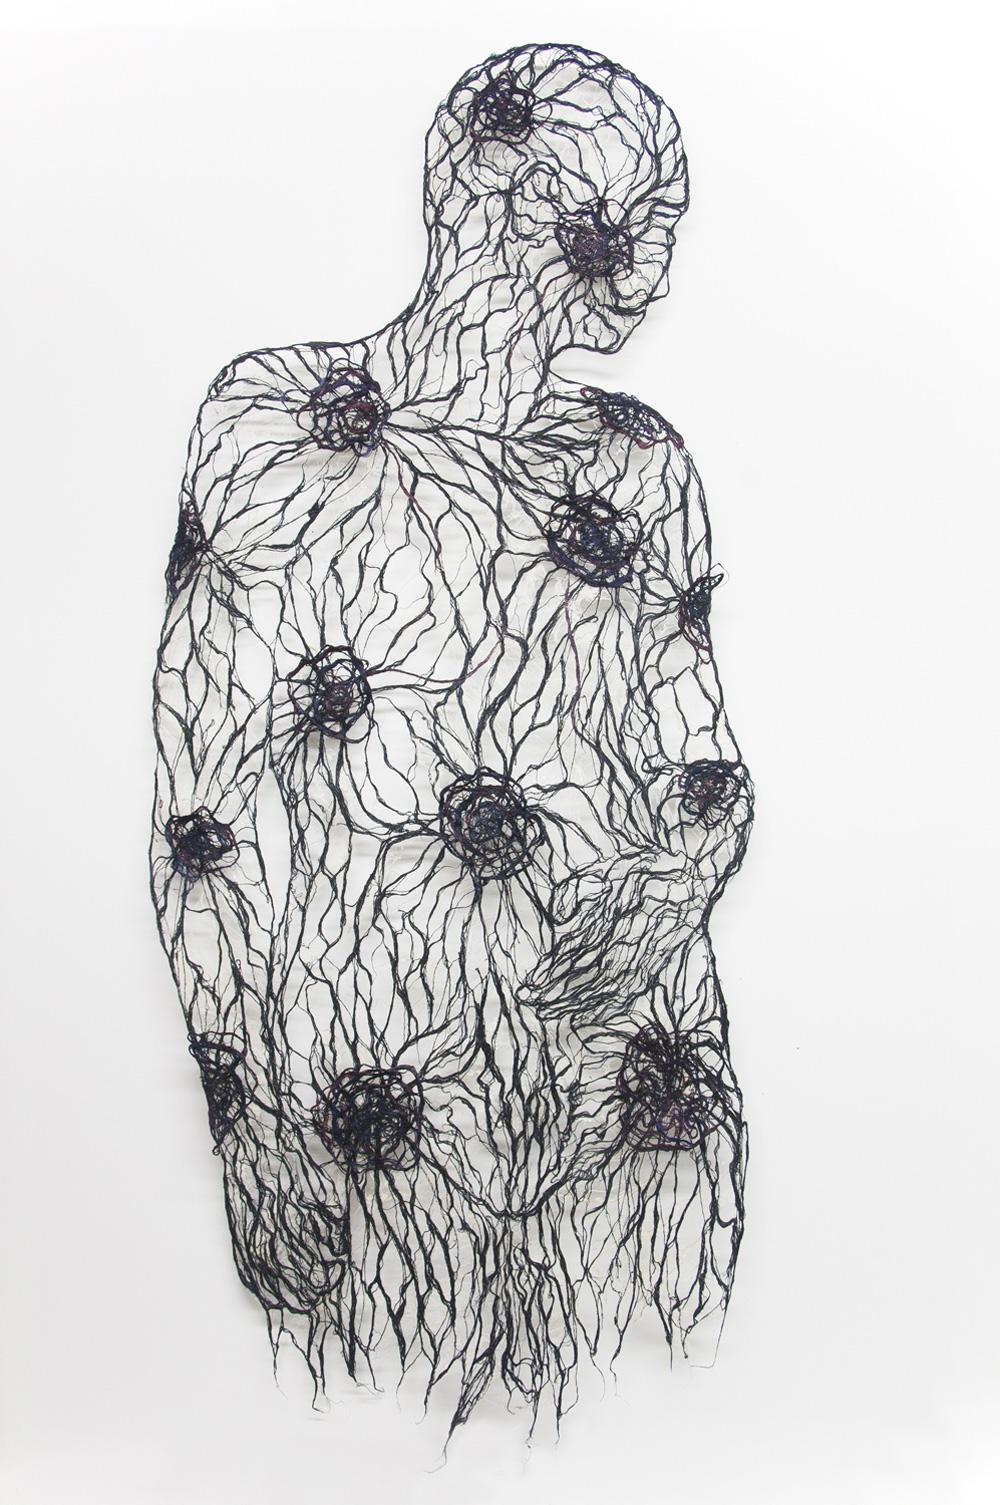 anatomy | Colossal